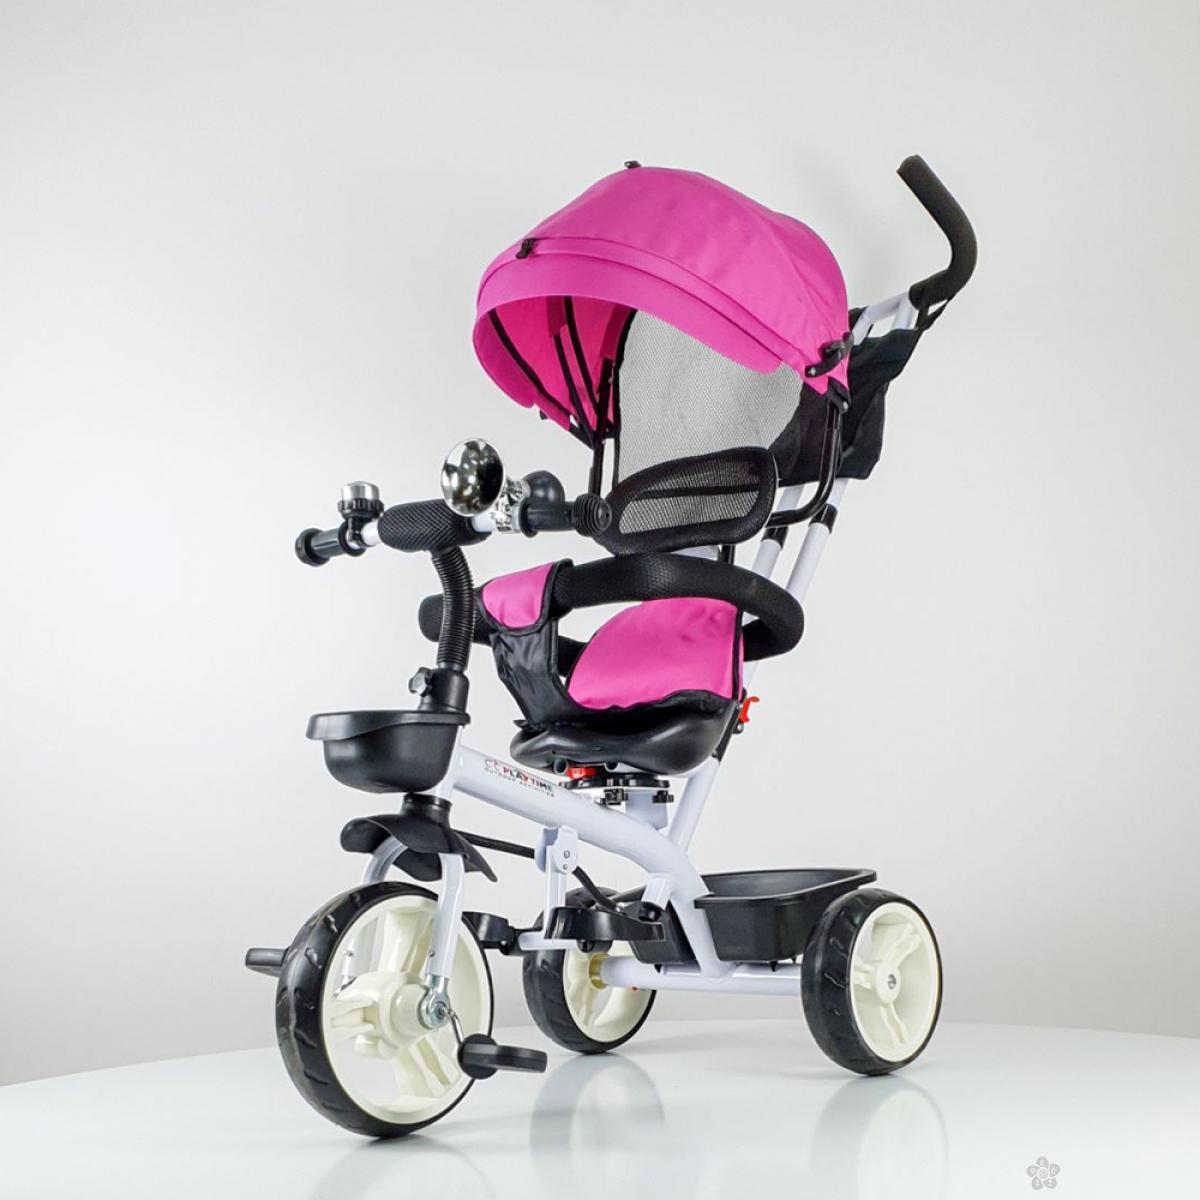 Tricikl Playtime model 439 ROZE